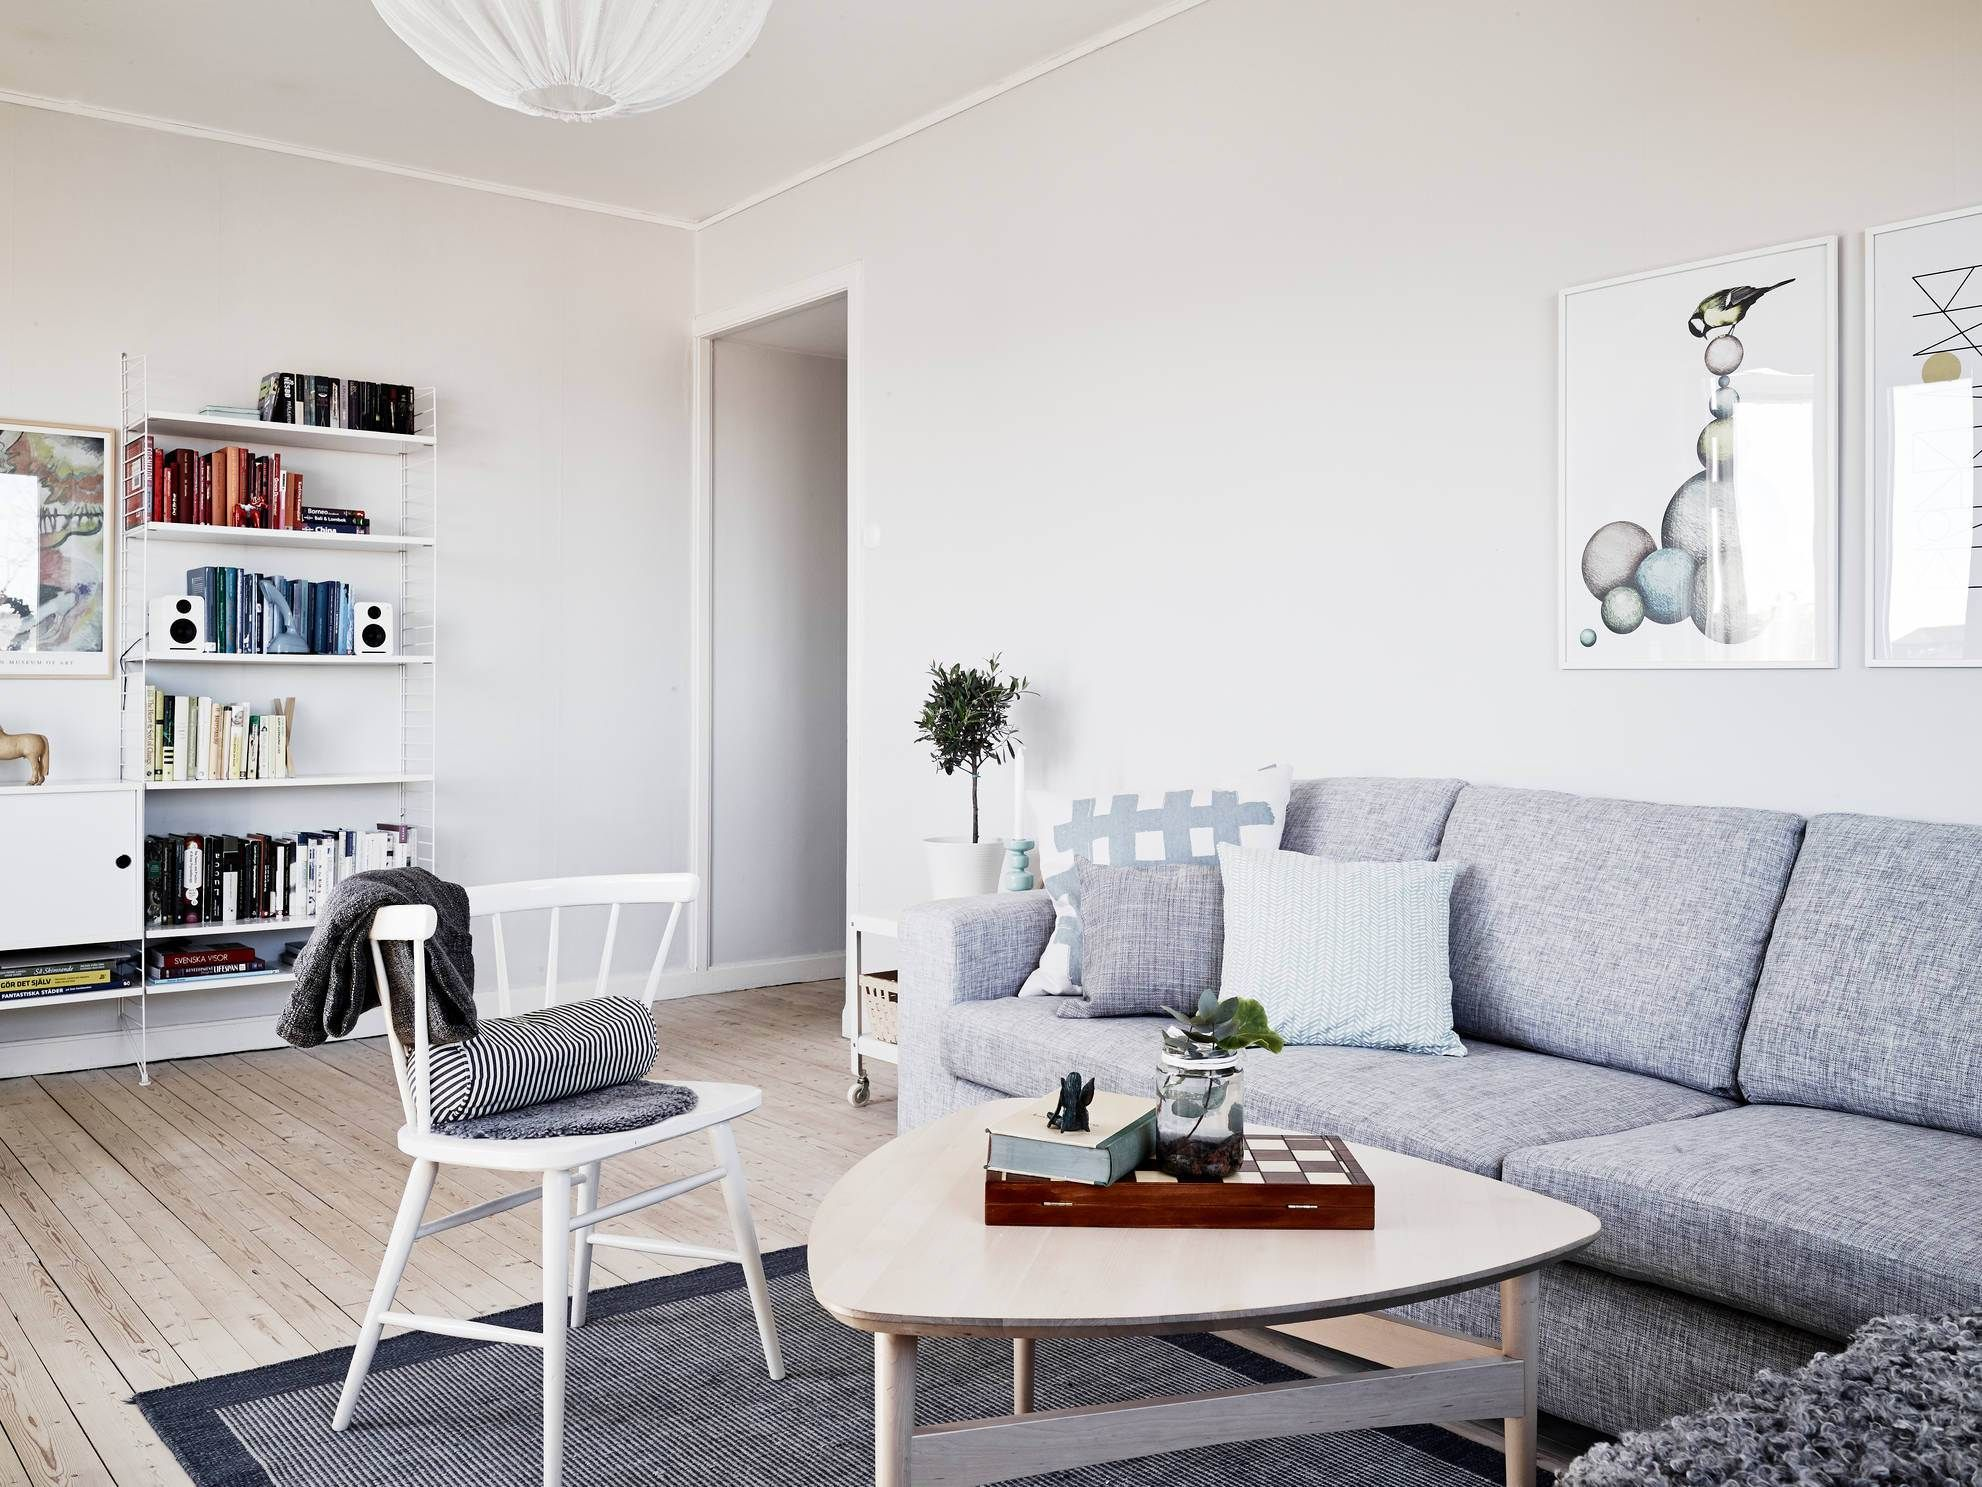 Soluciones gigantes para pisos peque os ideas decoradores piso top pinterest pisos - Ideas pisos pequenos ...